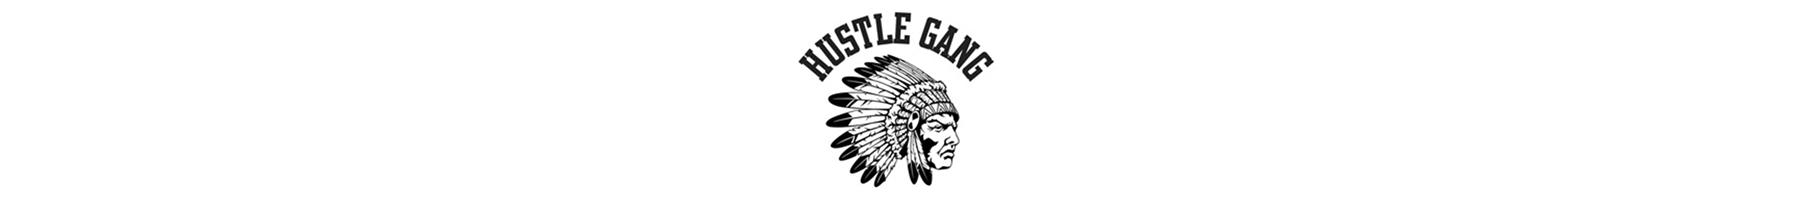 DrJays.com - Hustle Gang